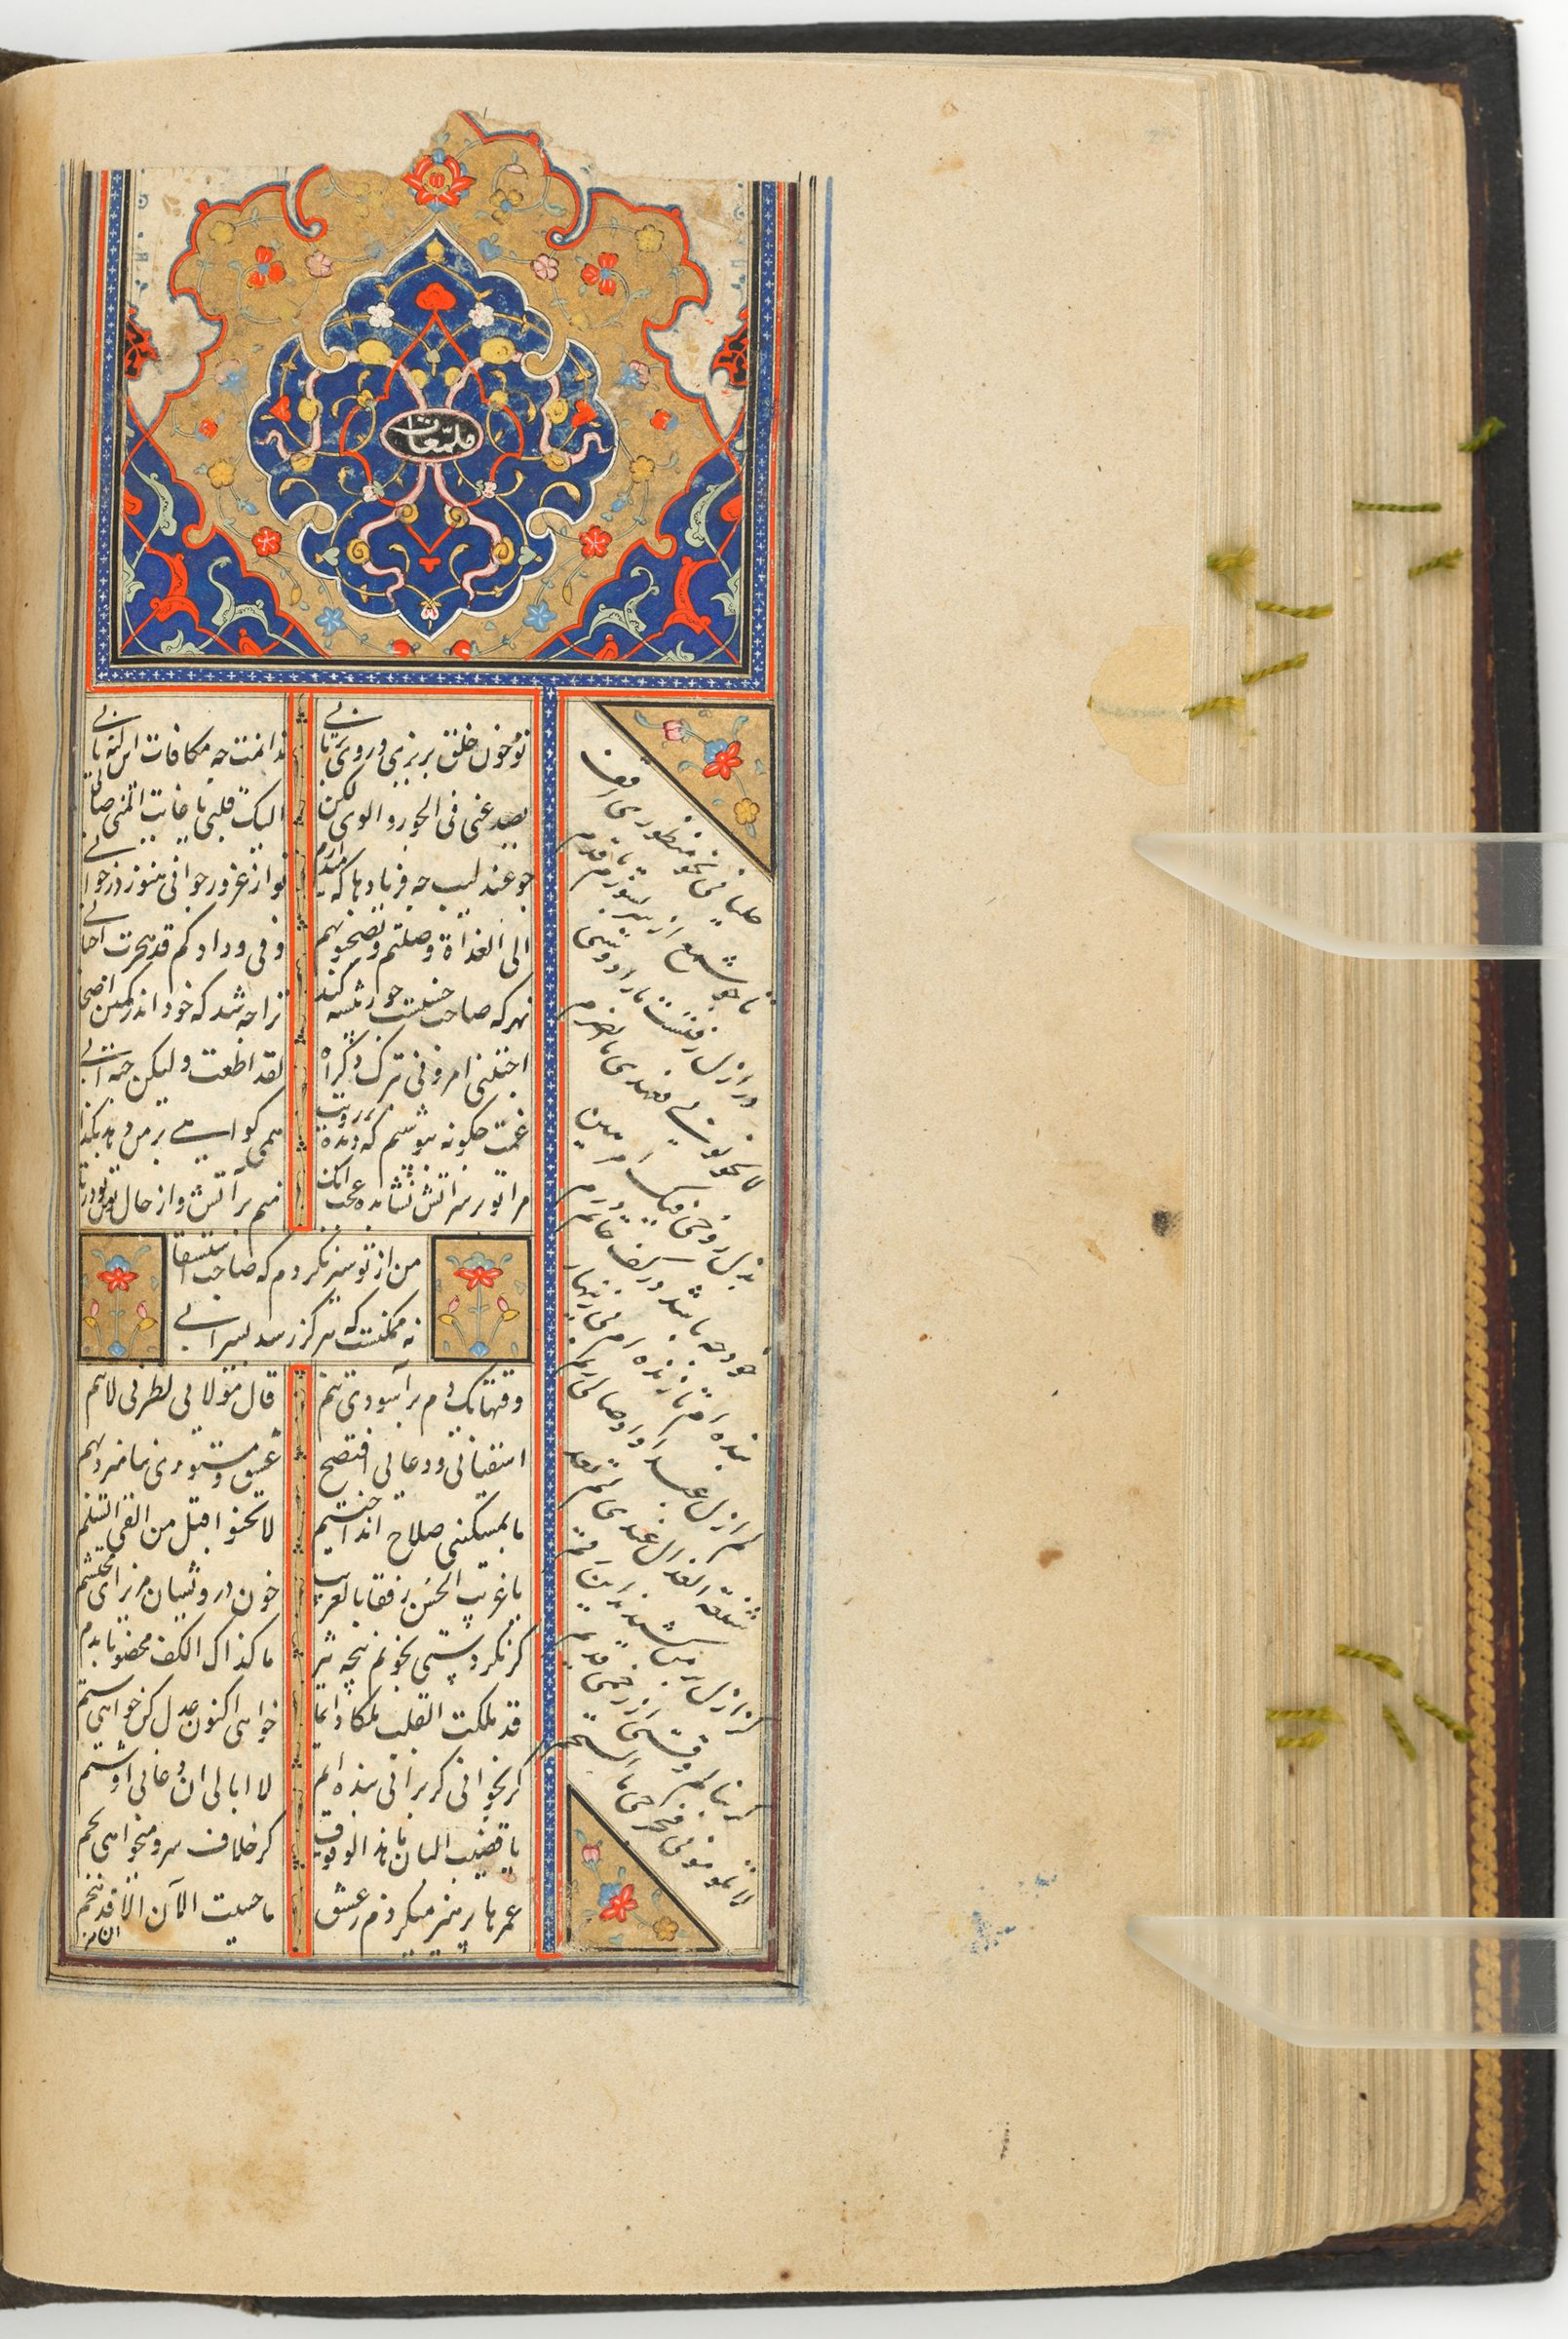 "Text Folio With An Illuminated Heading (Text Recto; Text With An Illuminated Heading Verso Of Folio 182), From A Manuscript Of The Kulliyat Of Sa'di""."